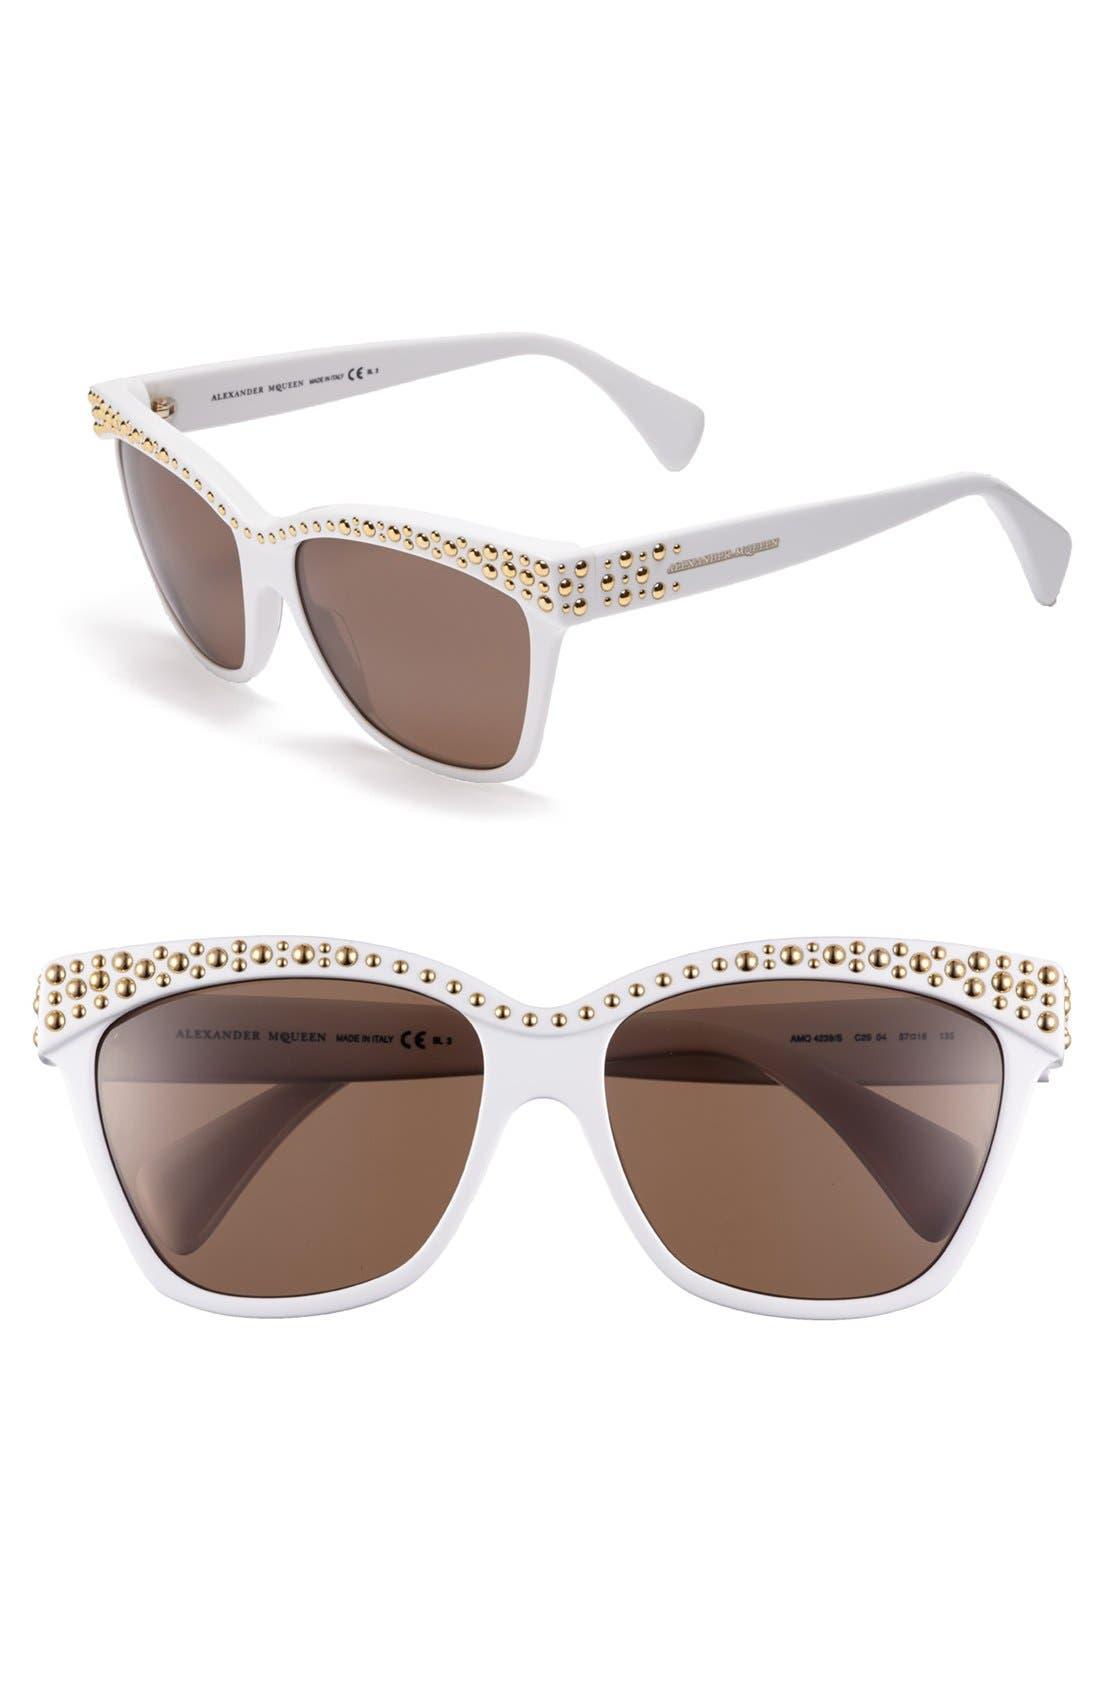 Main Image - Alexander McQueen 57mm Studded Sunglasses